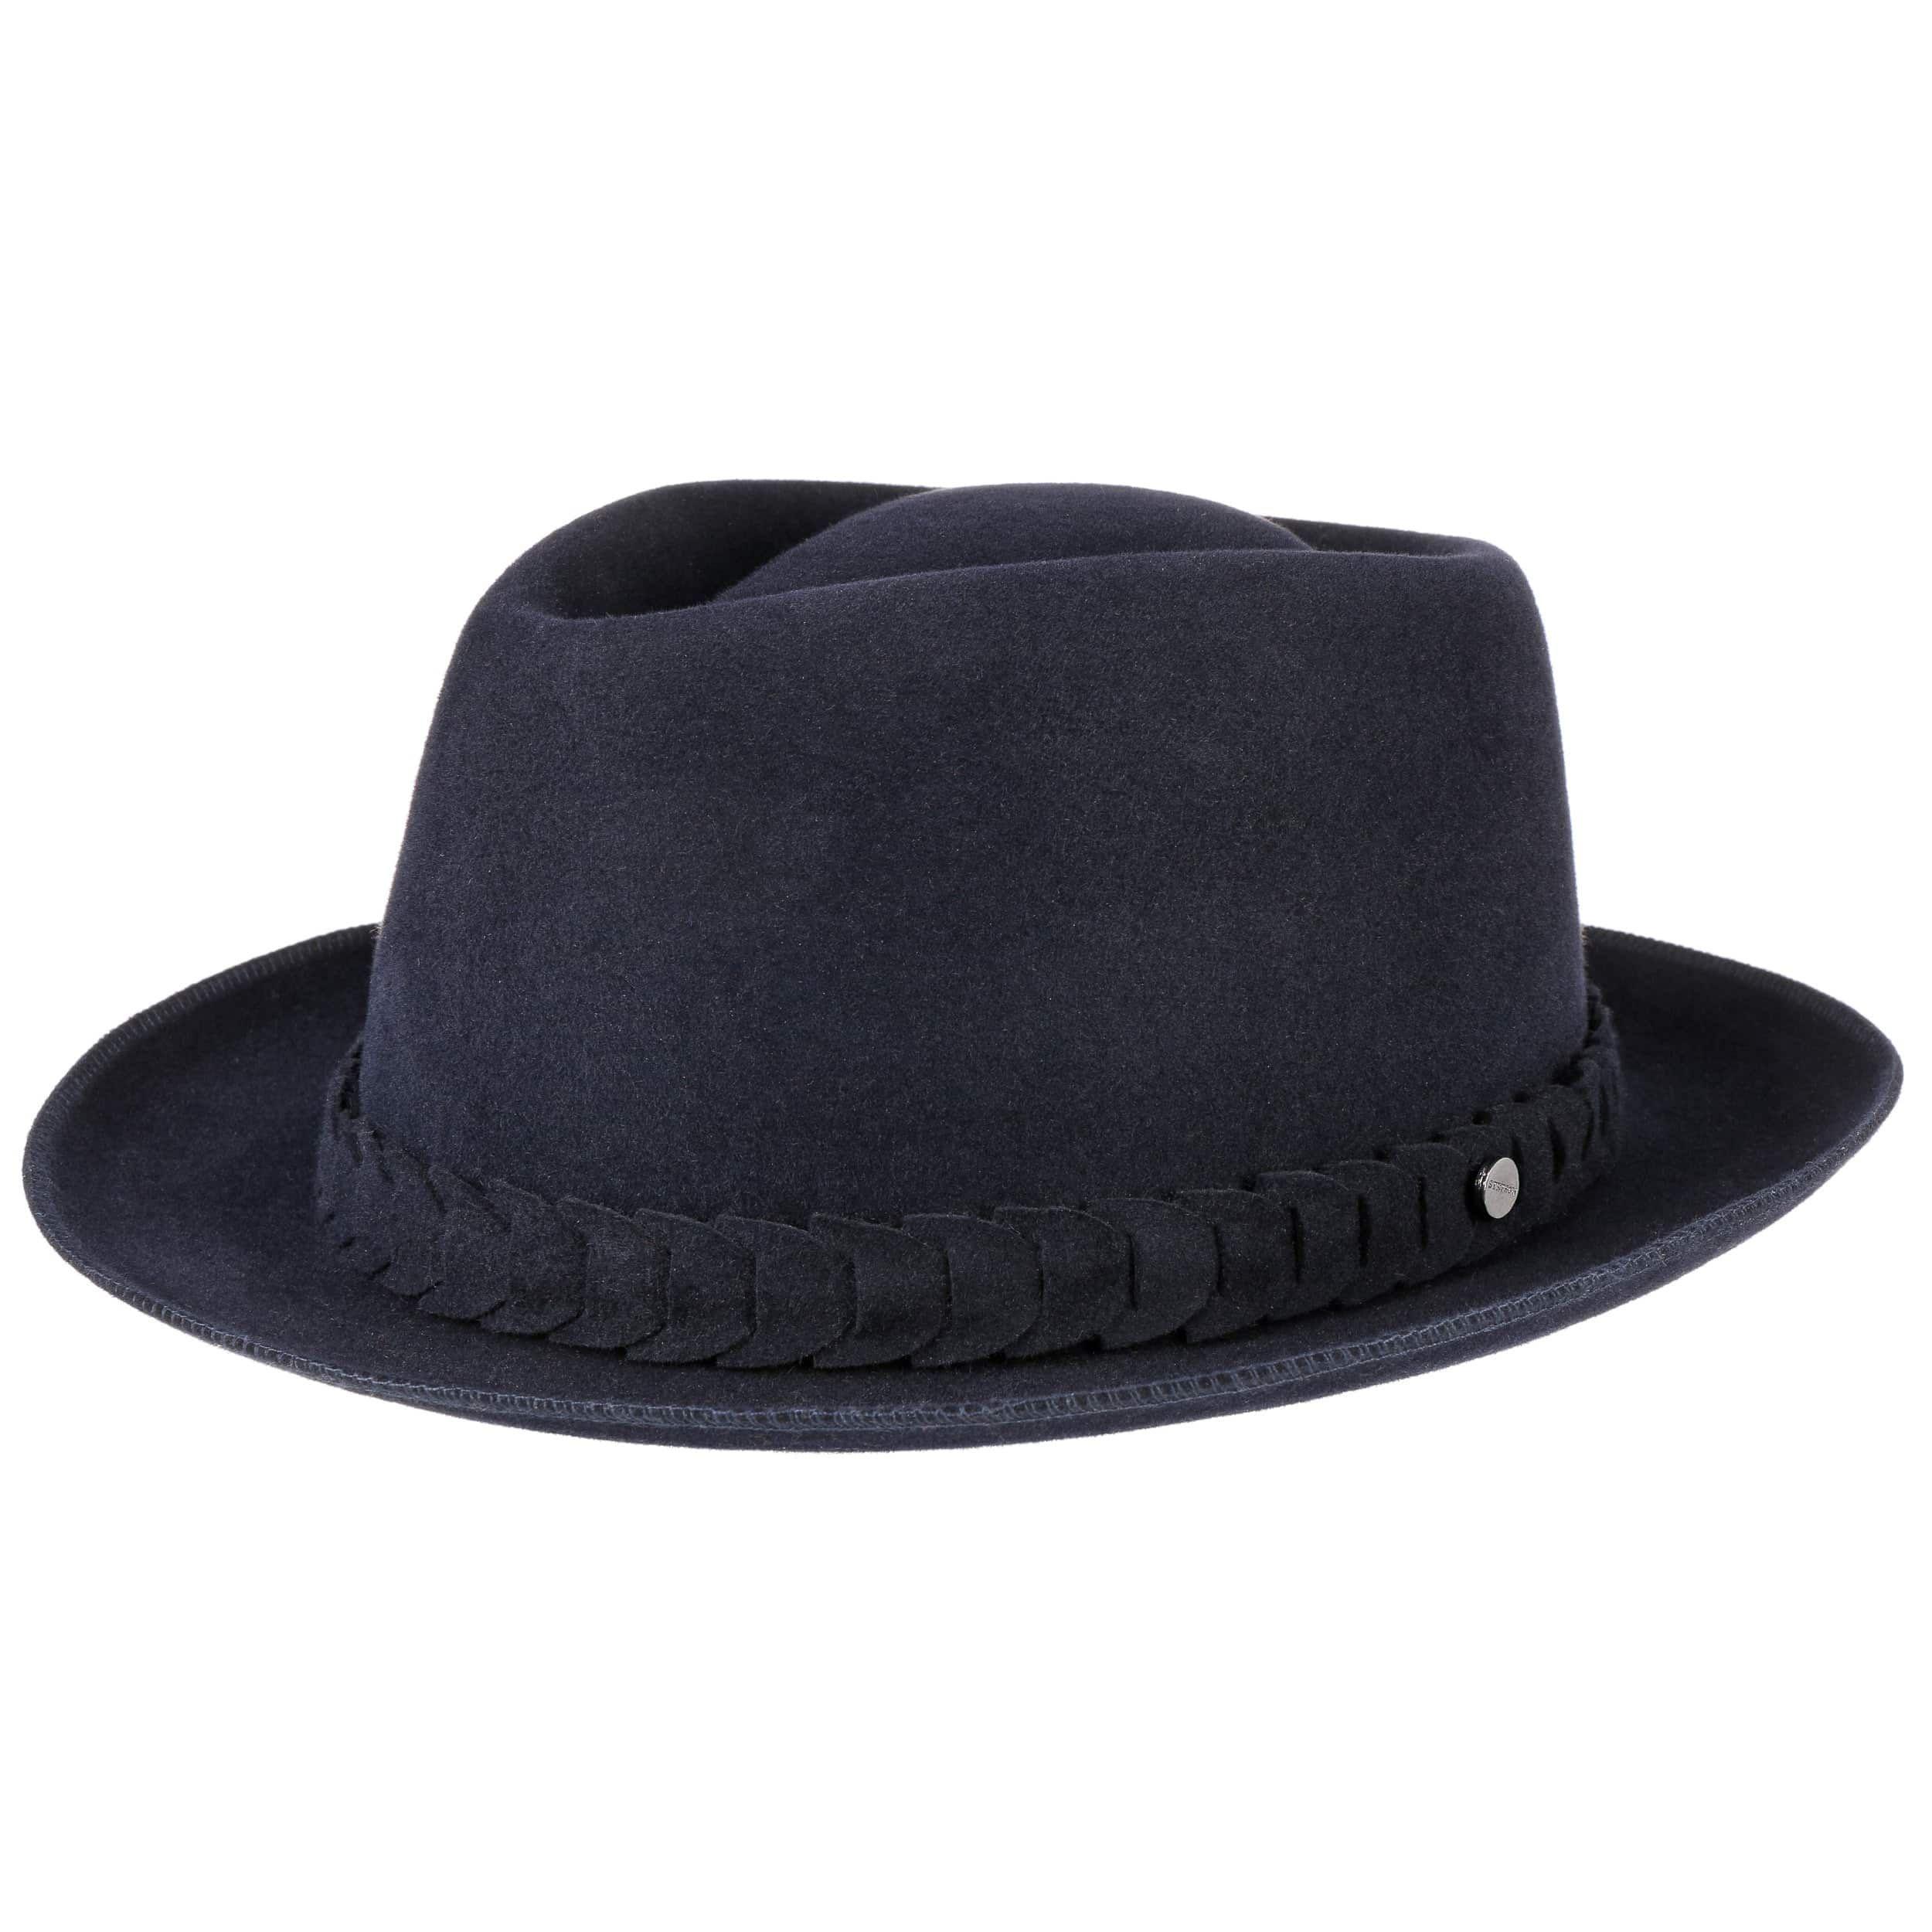 Welby Fur Felt Hat navy